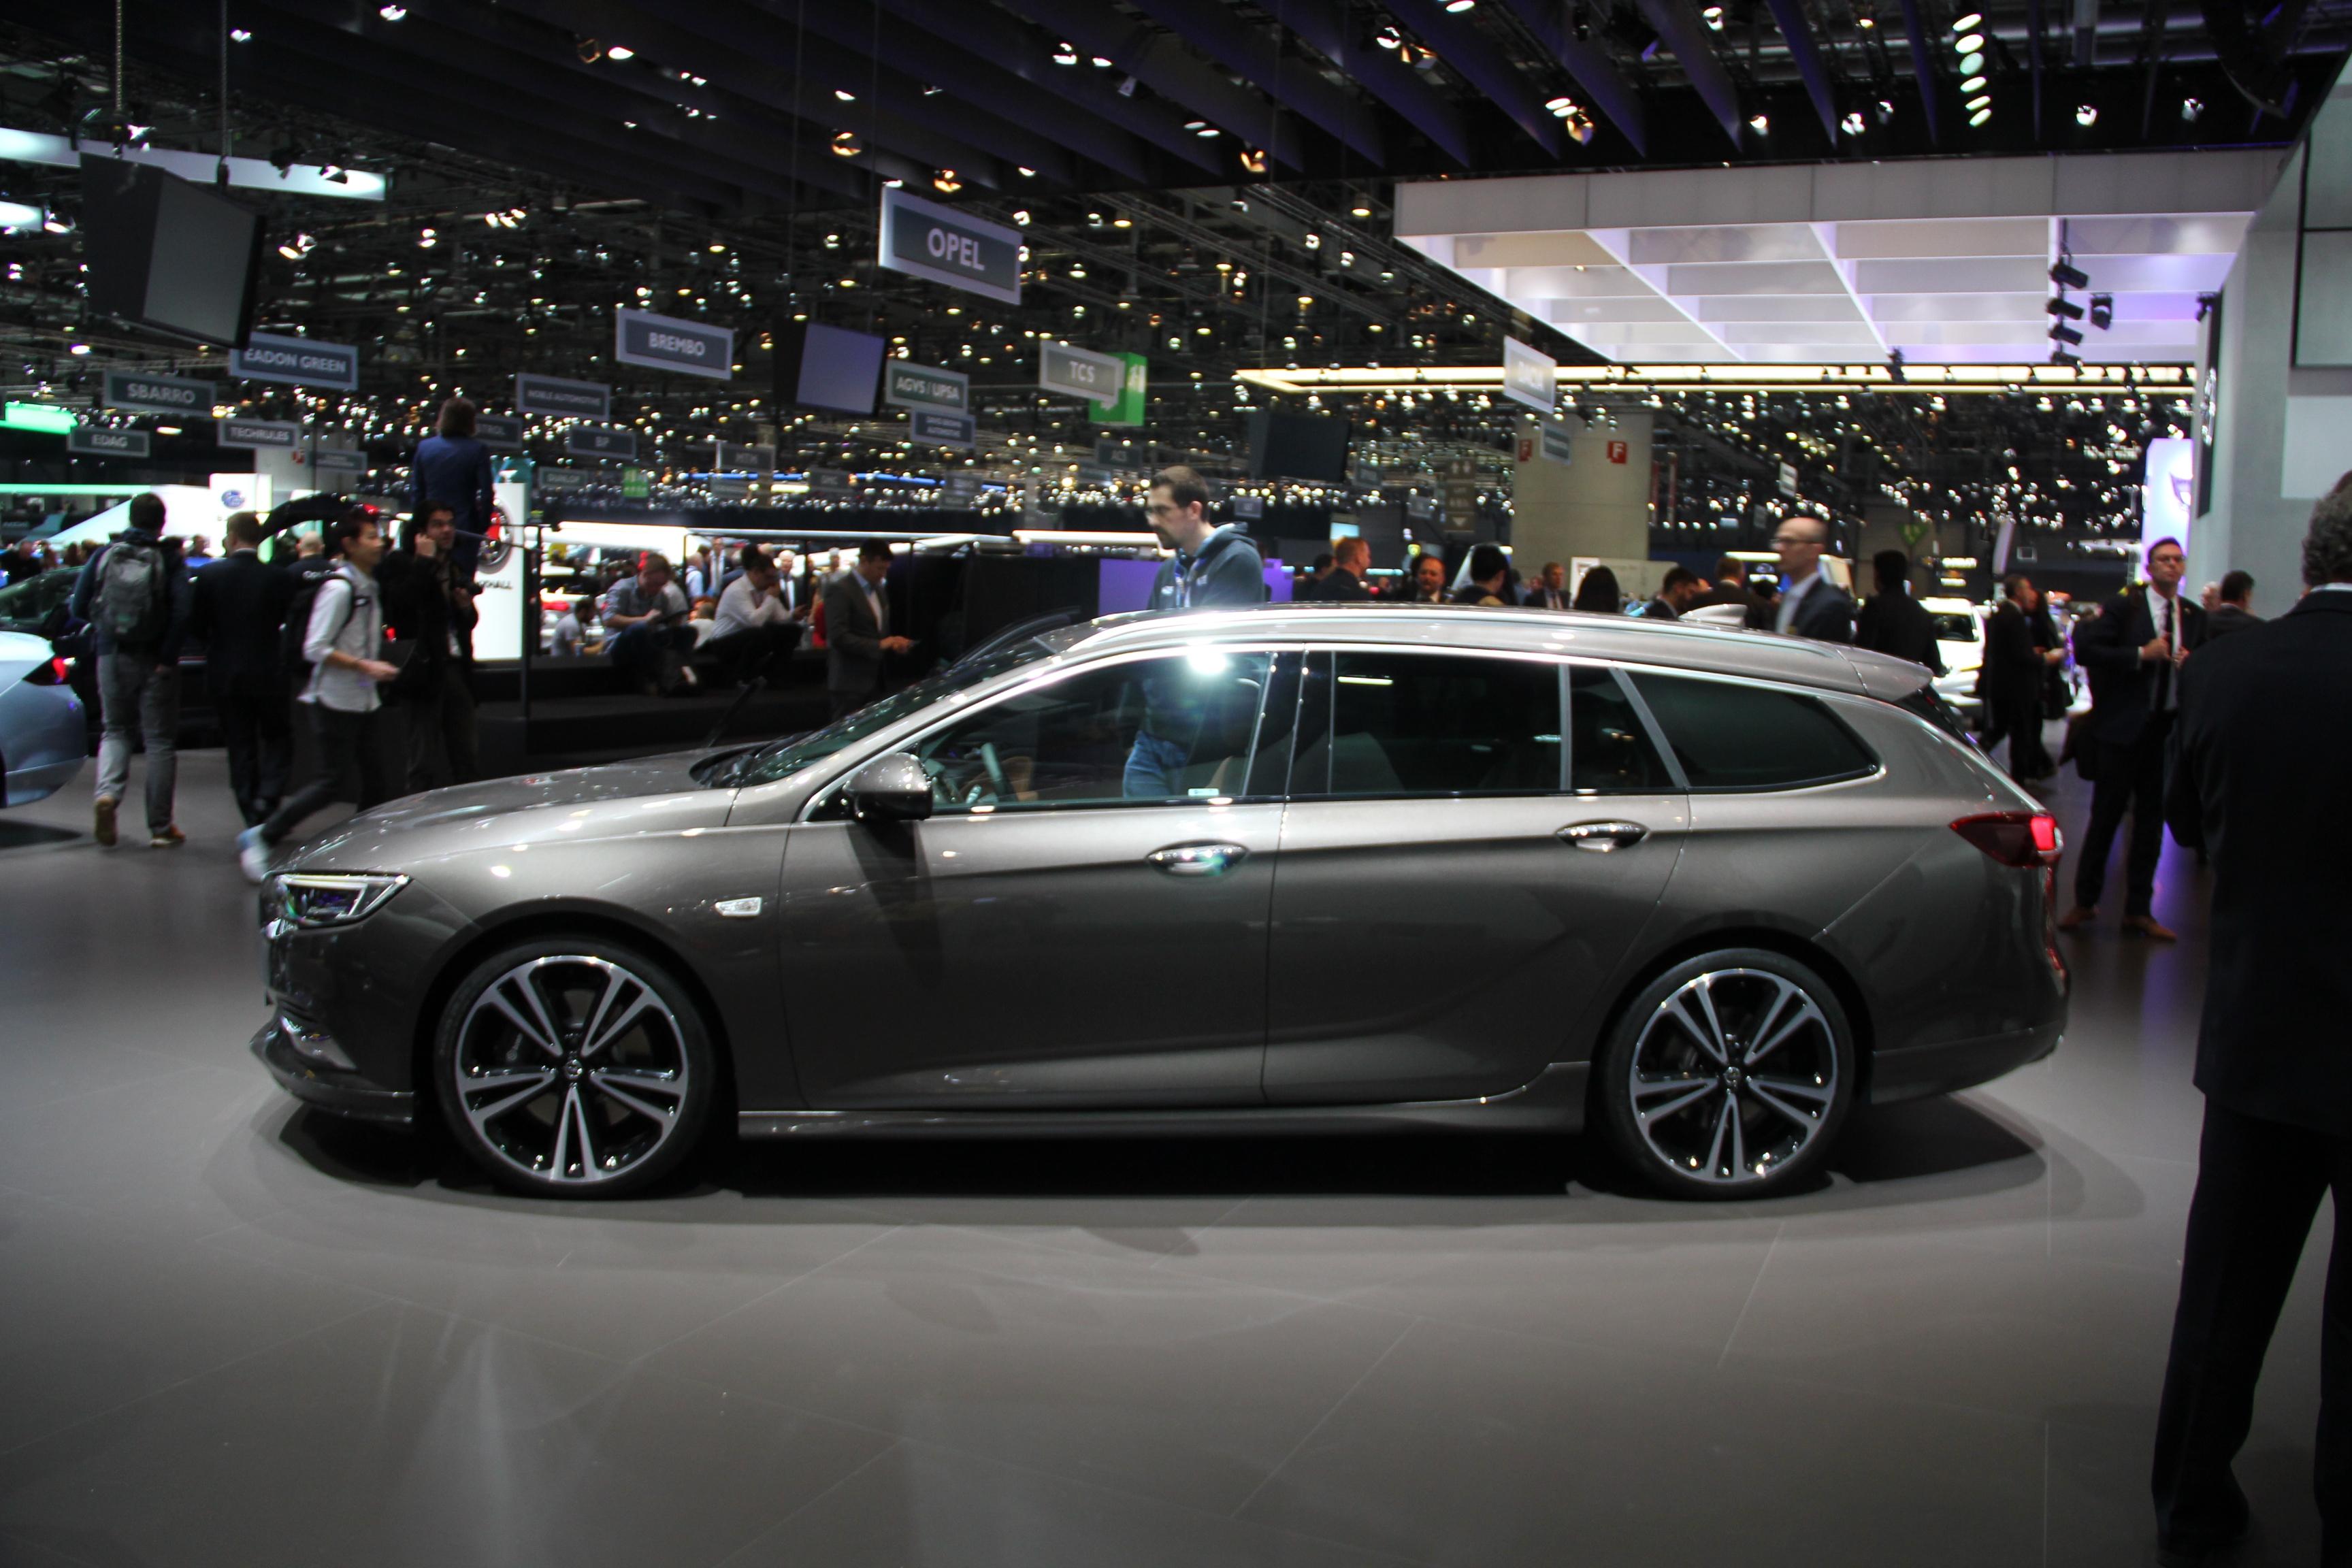 Opel insignia sports tourer gigantesque vid o en for Offre d emploi salon de l auto geneve